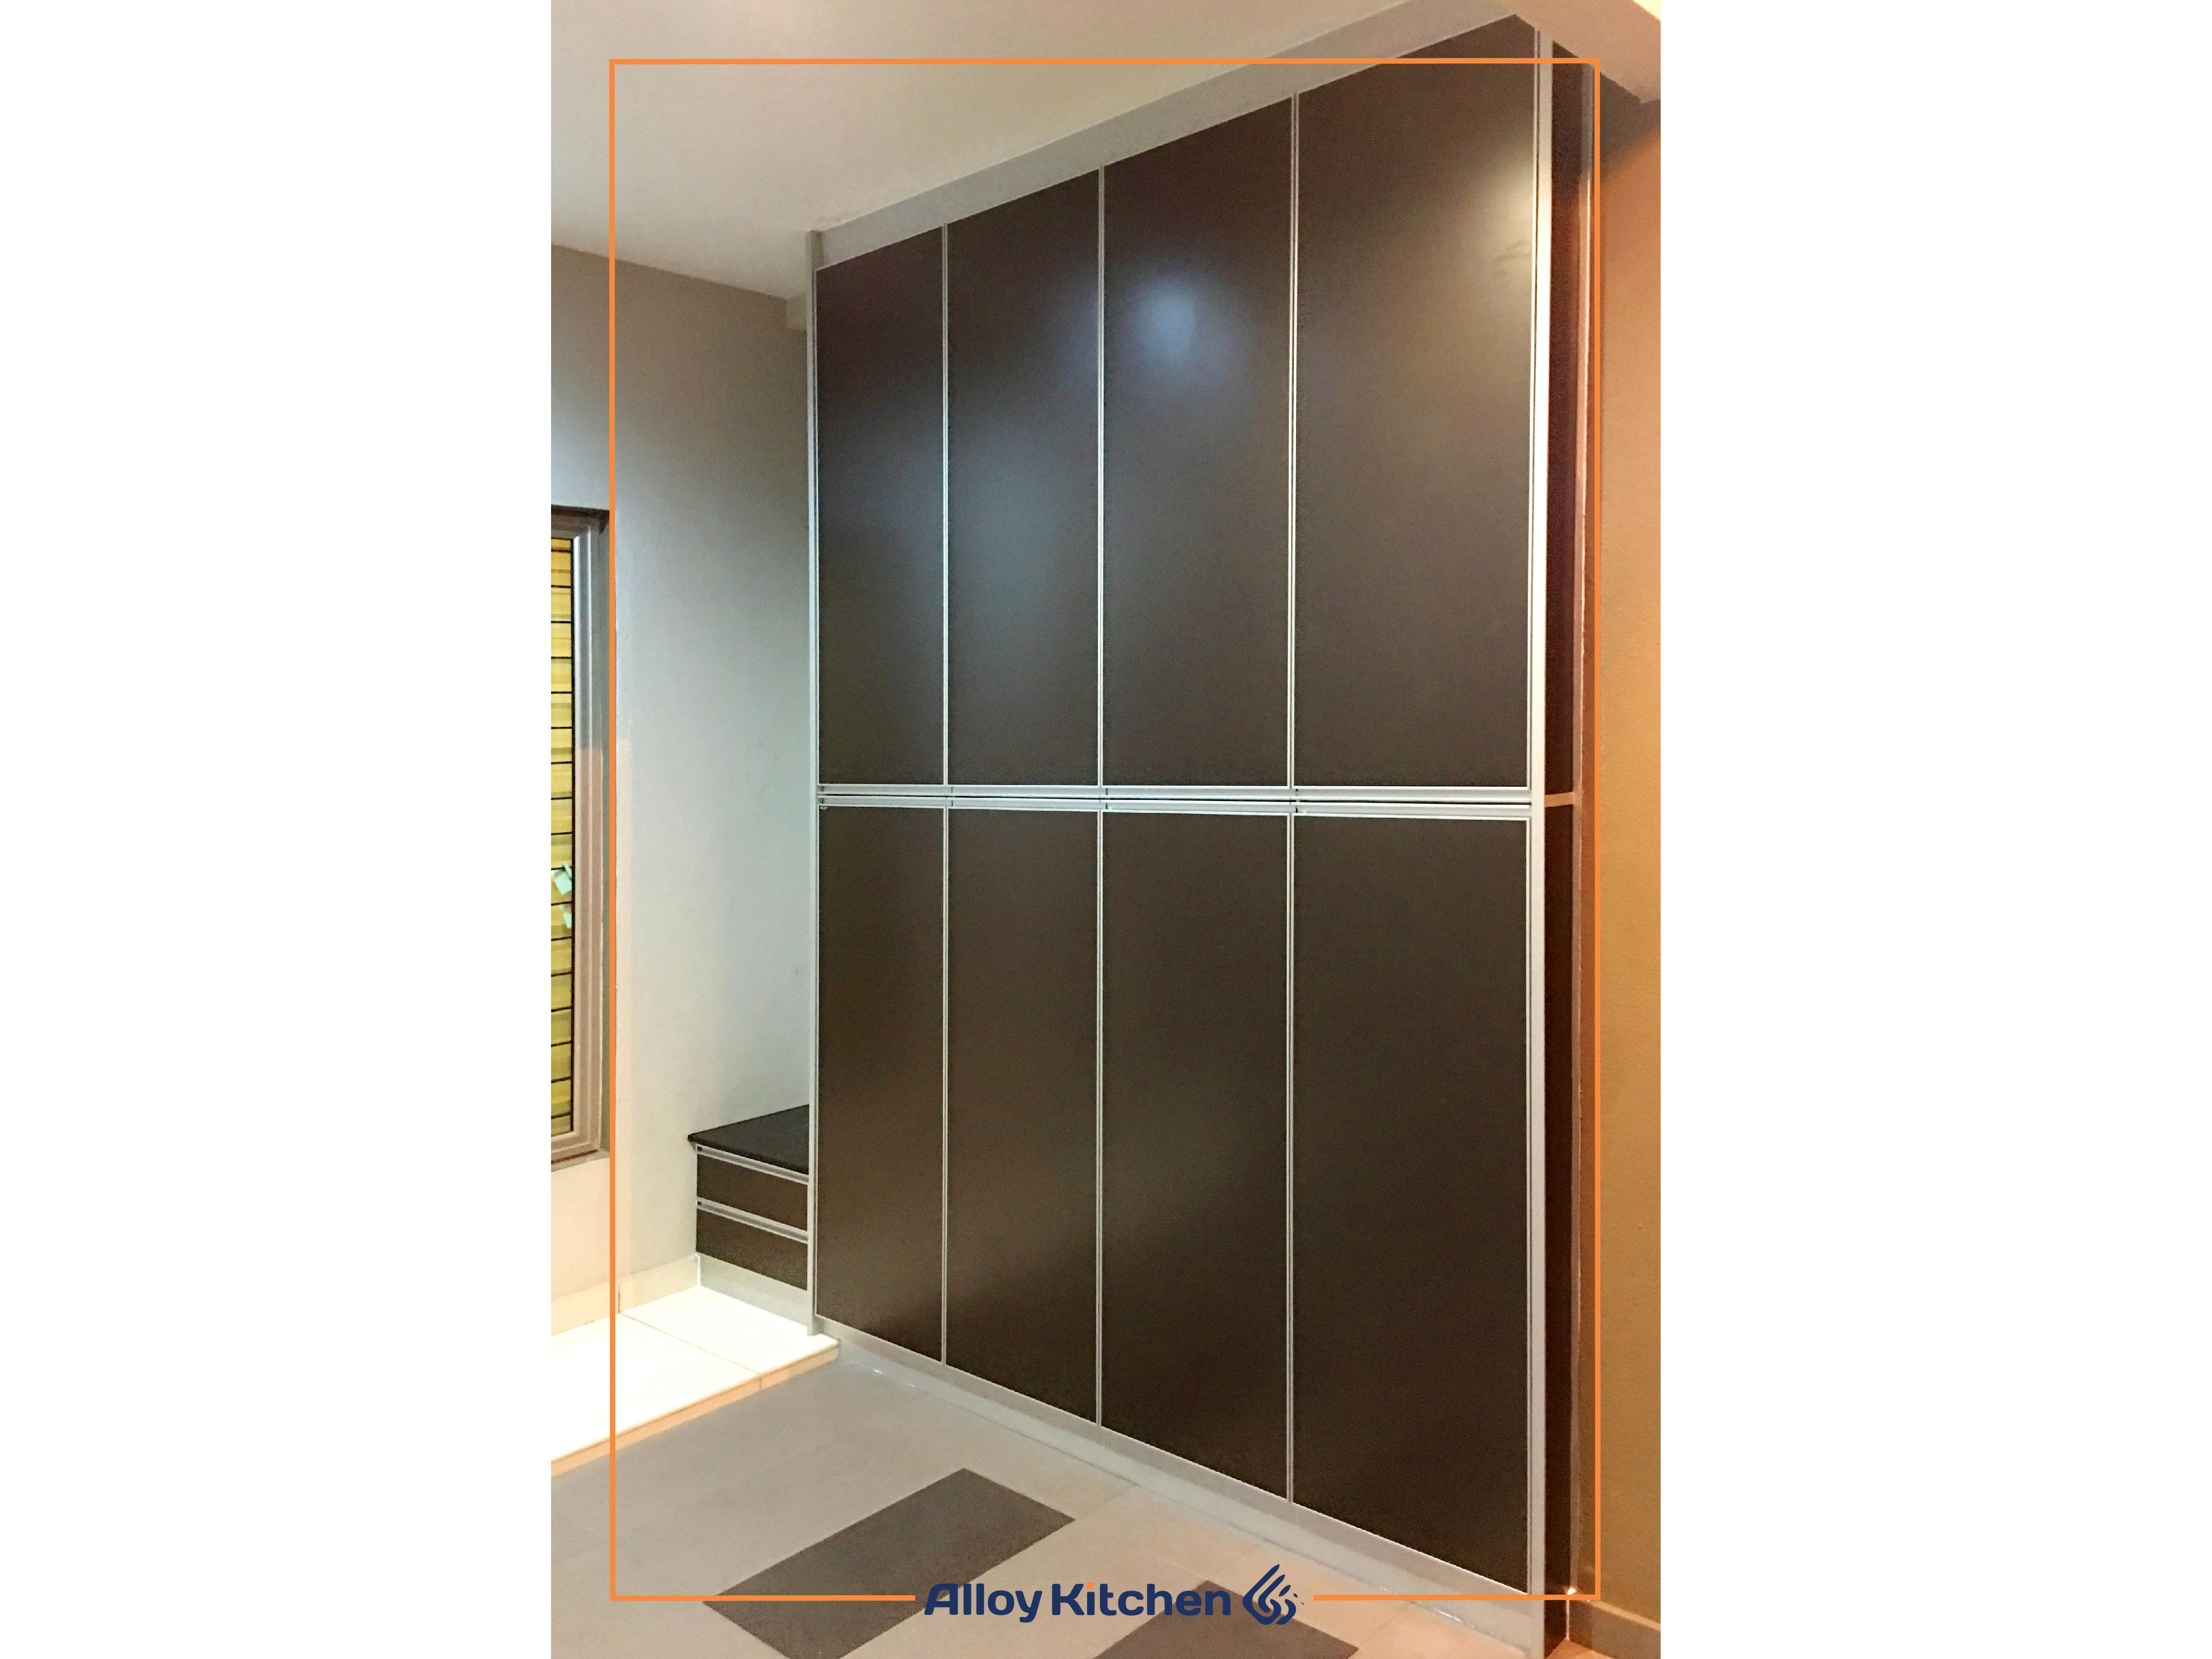 Alloy_Kitchen_Aluminium_Shoe_Rack / Alloy Kitchen Aluminium Shoe Rack / Cabinet ACP